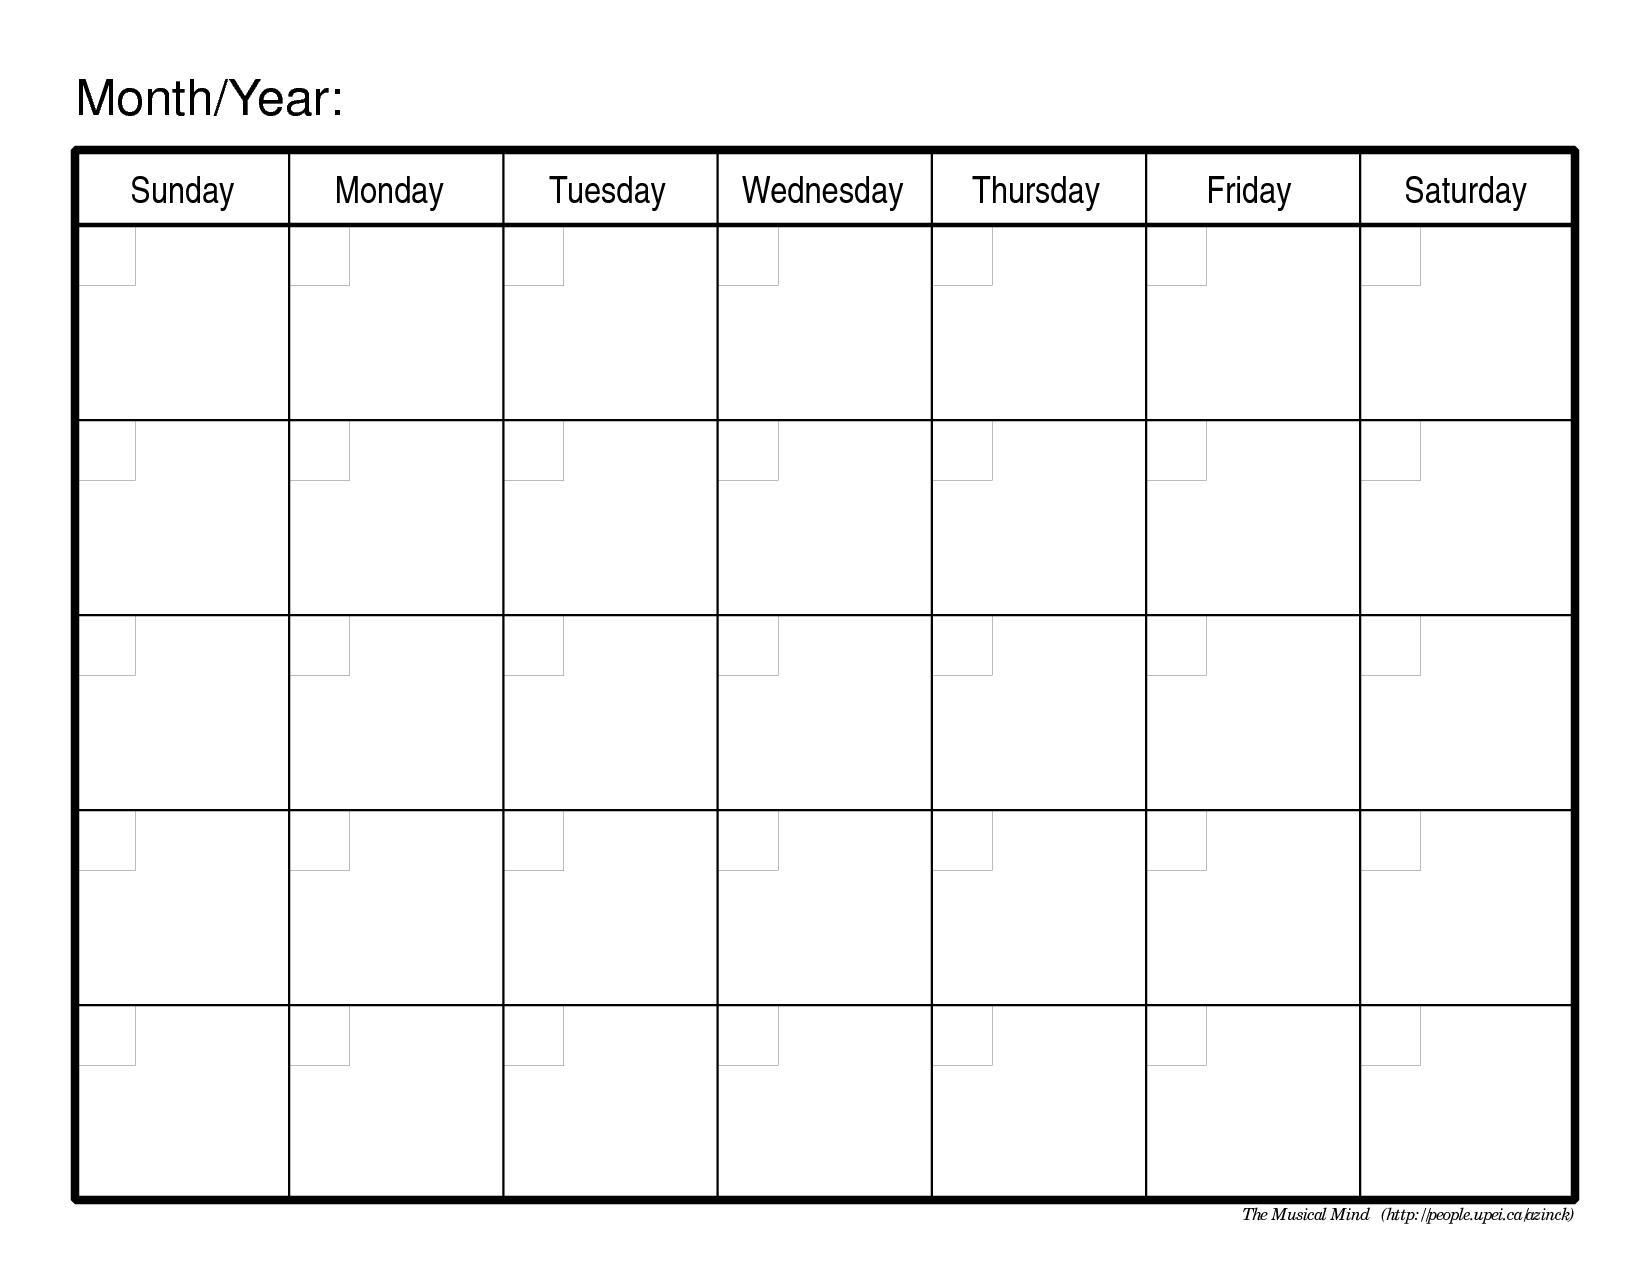 001 Template Ideas Blank Monthly Calendar Pdf Printable Mdxar within Monthly Calendar Printable Blank Pdf